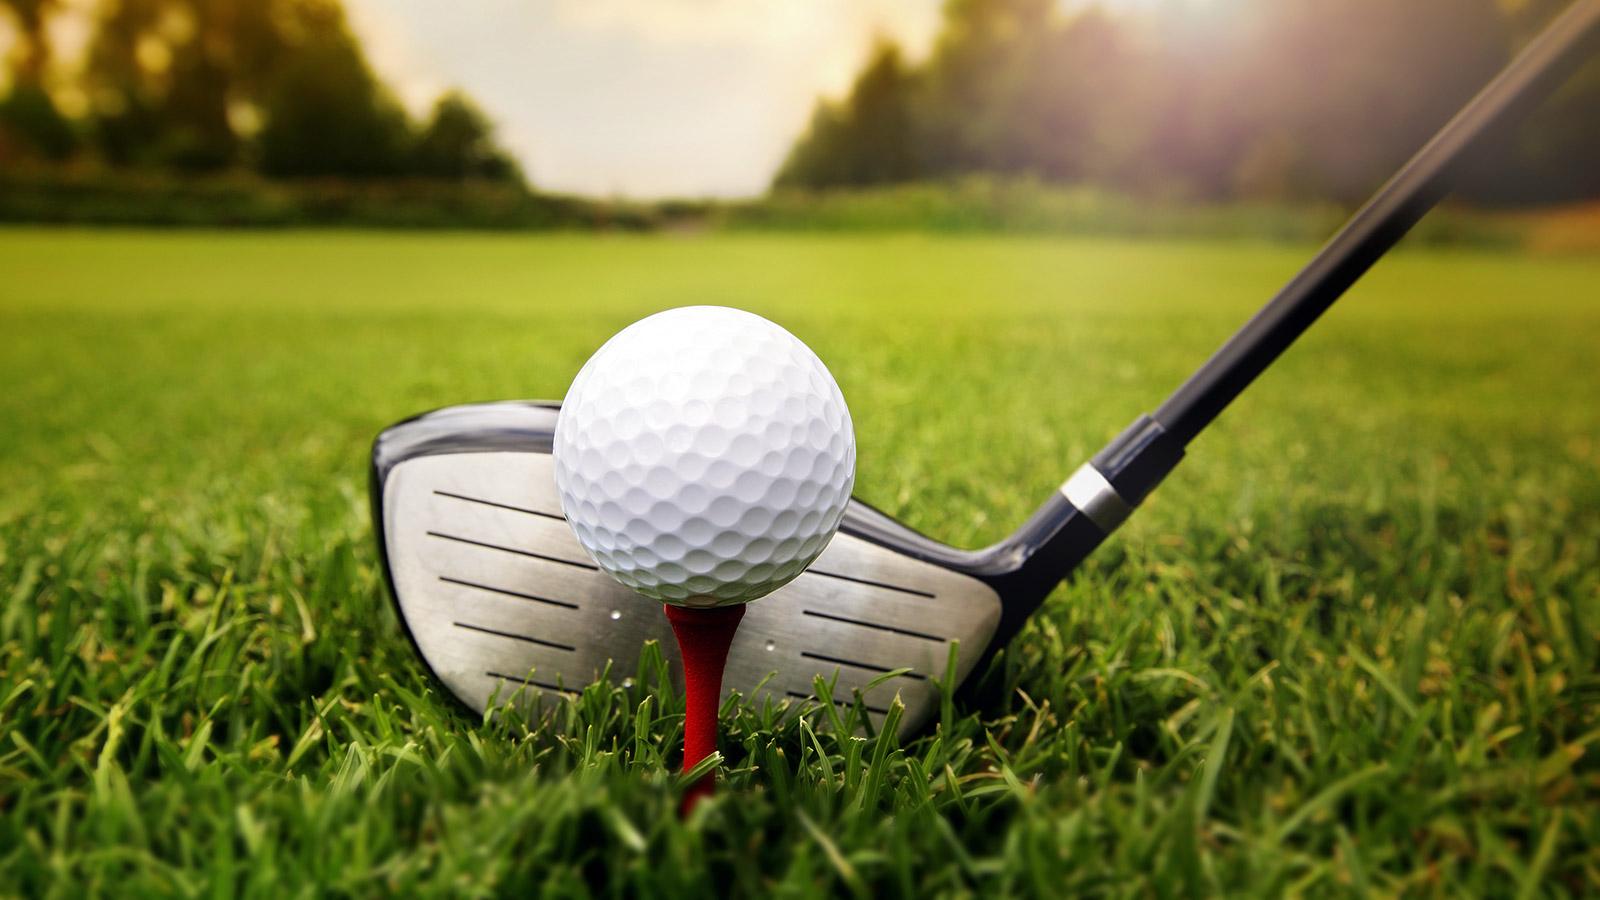 Giocare a golf, tra salute e lusso